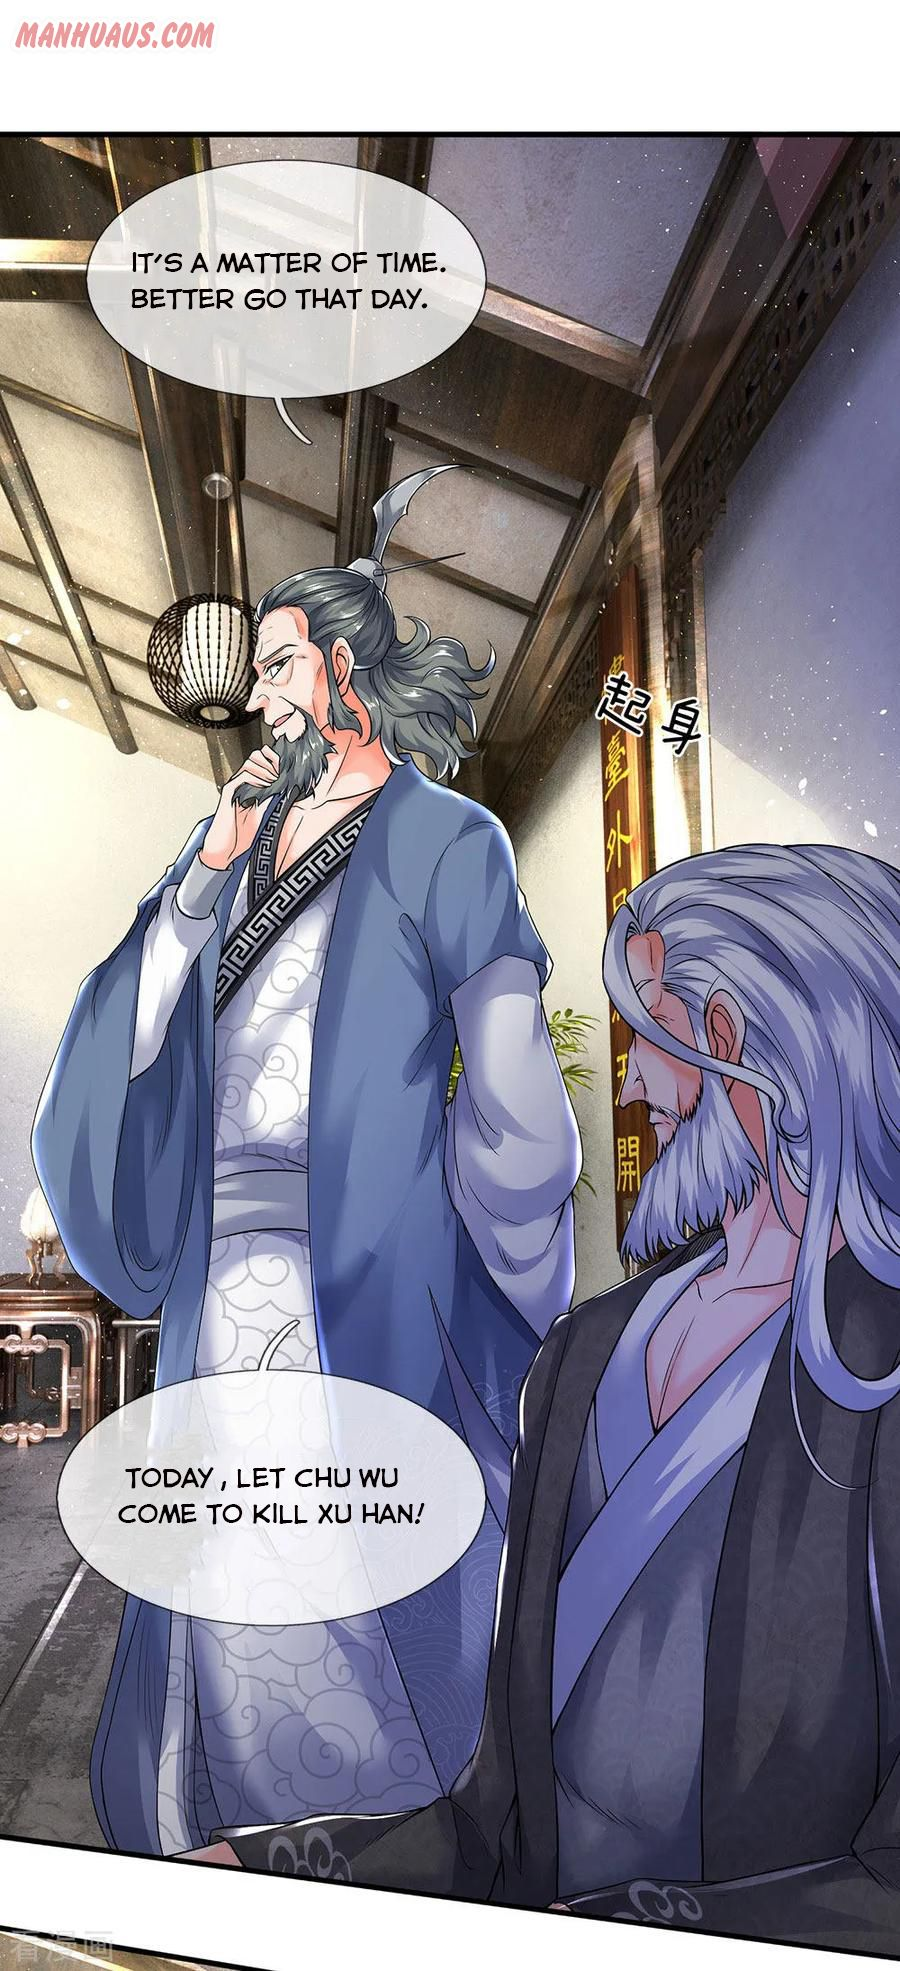 https://manga.mangadogs.com/comics/pic4/39/32615/2841468/42b88c8b68686b308746c7b9667ecb2c.jpg Page 1